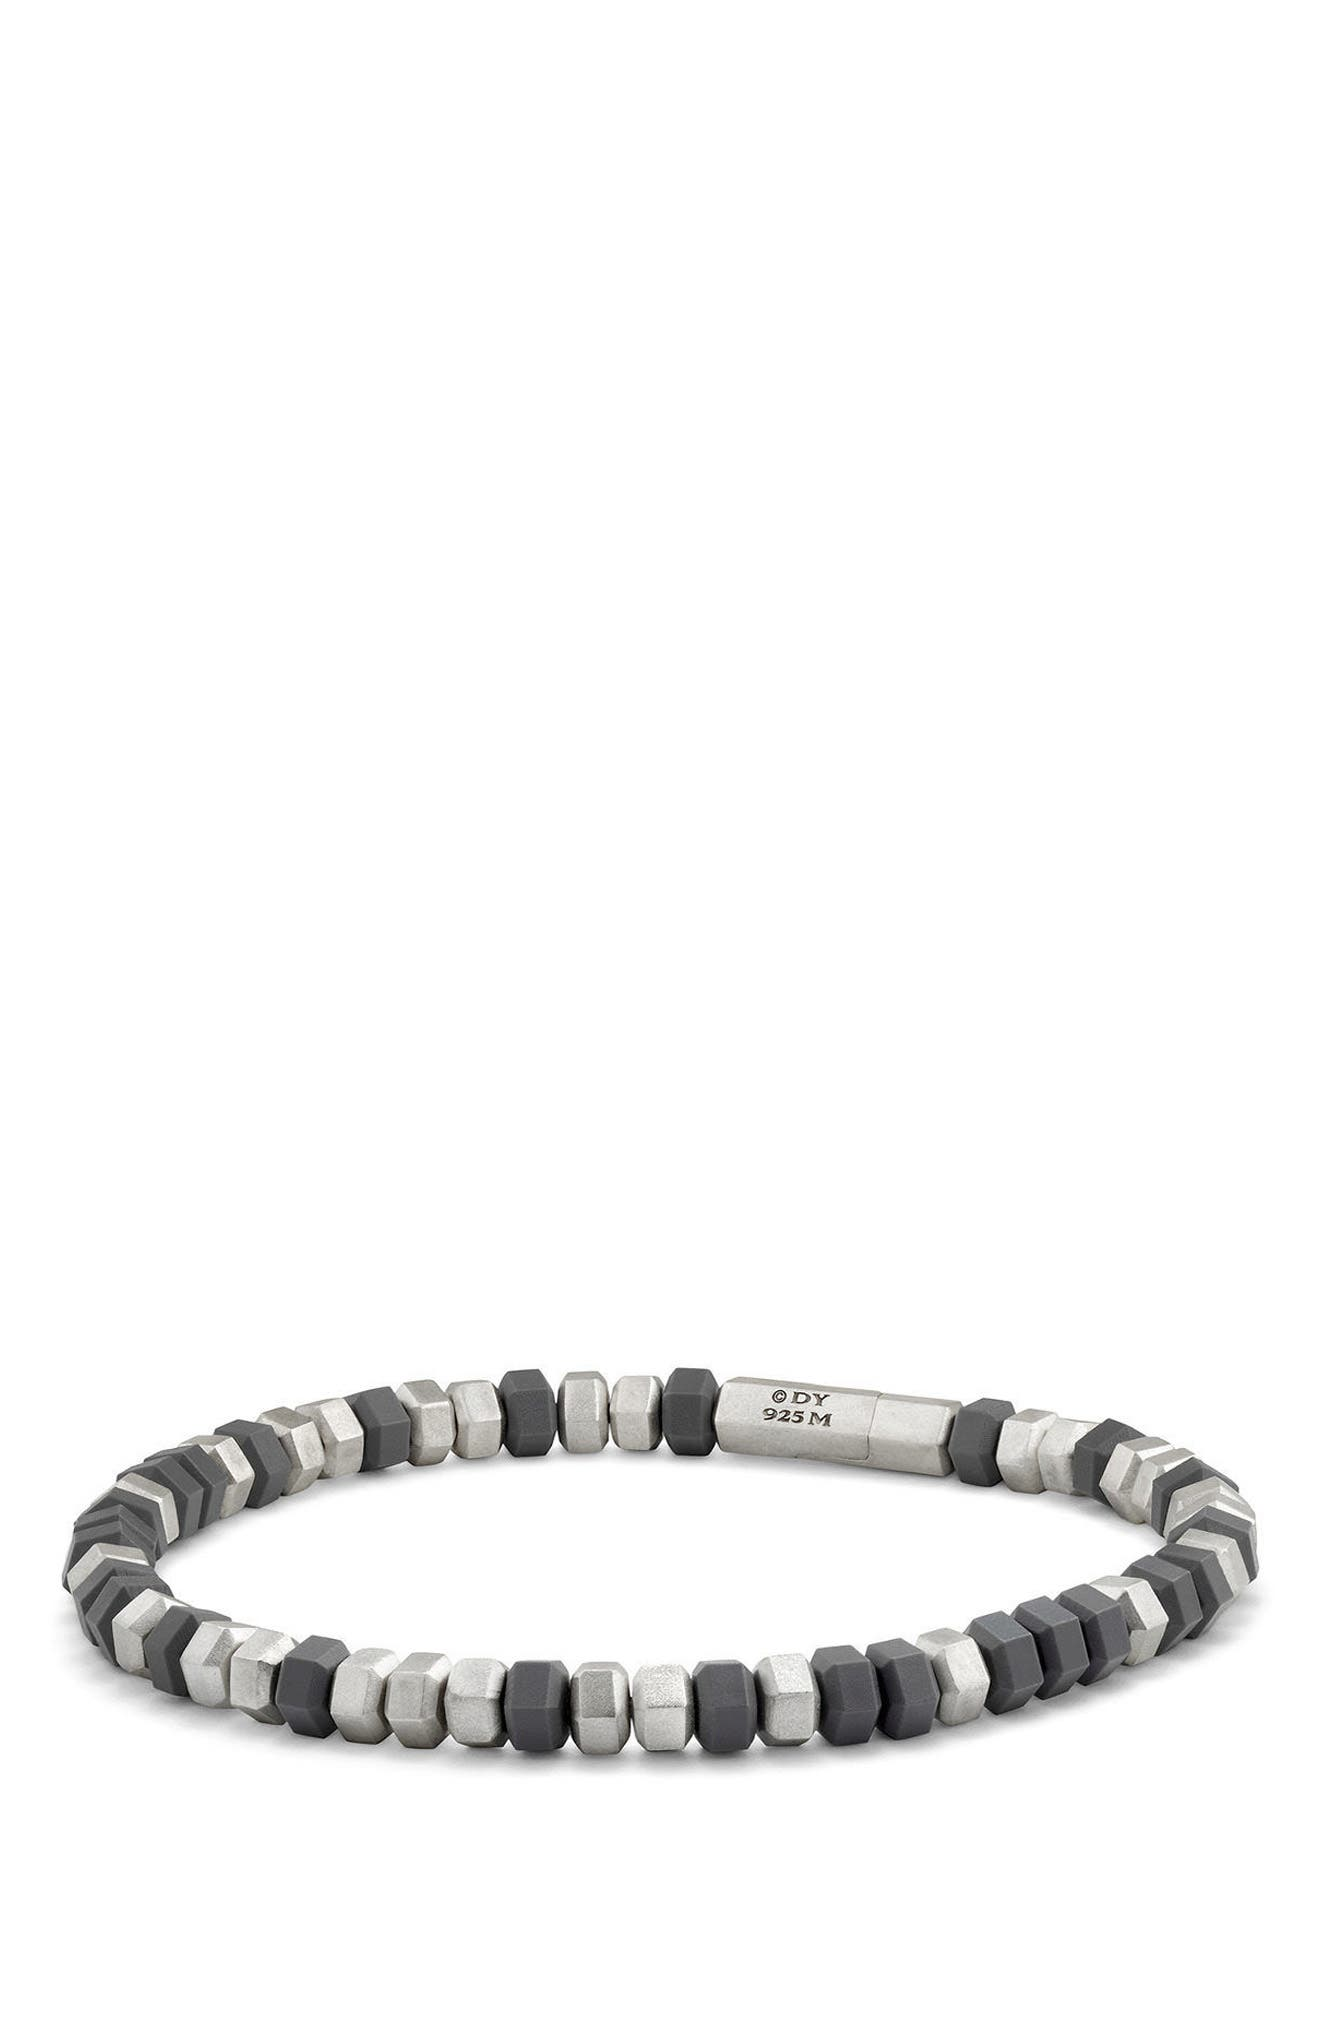 David Yurman Hex Bead Bracelet